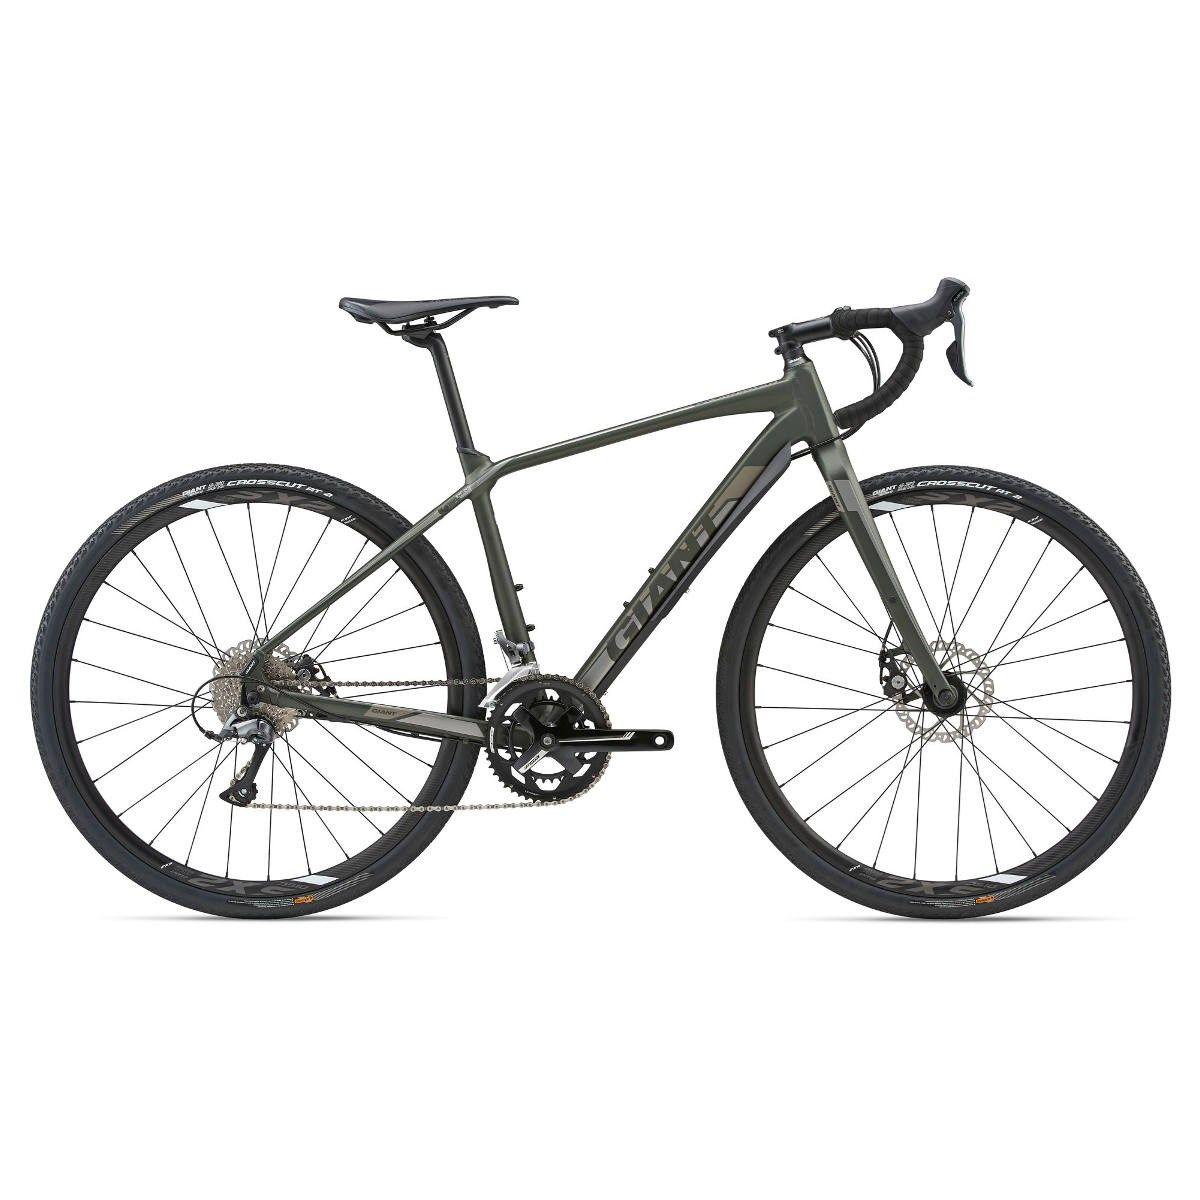 Giant Toughroad Slr Gx 3 2018 Gravel Road Bike Green Bicycle